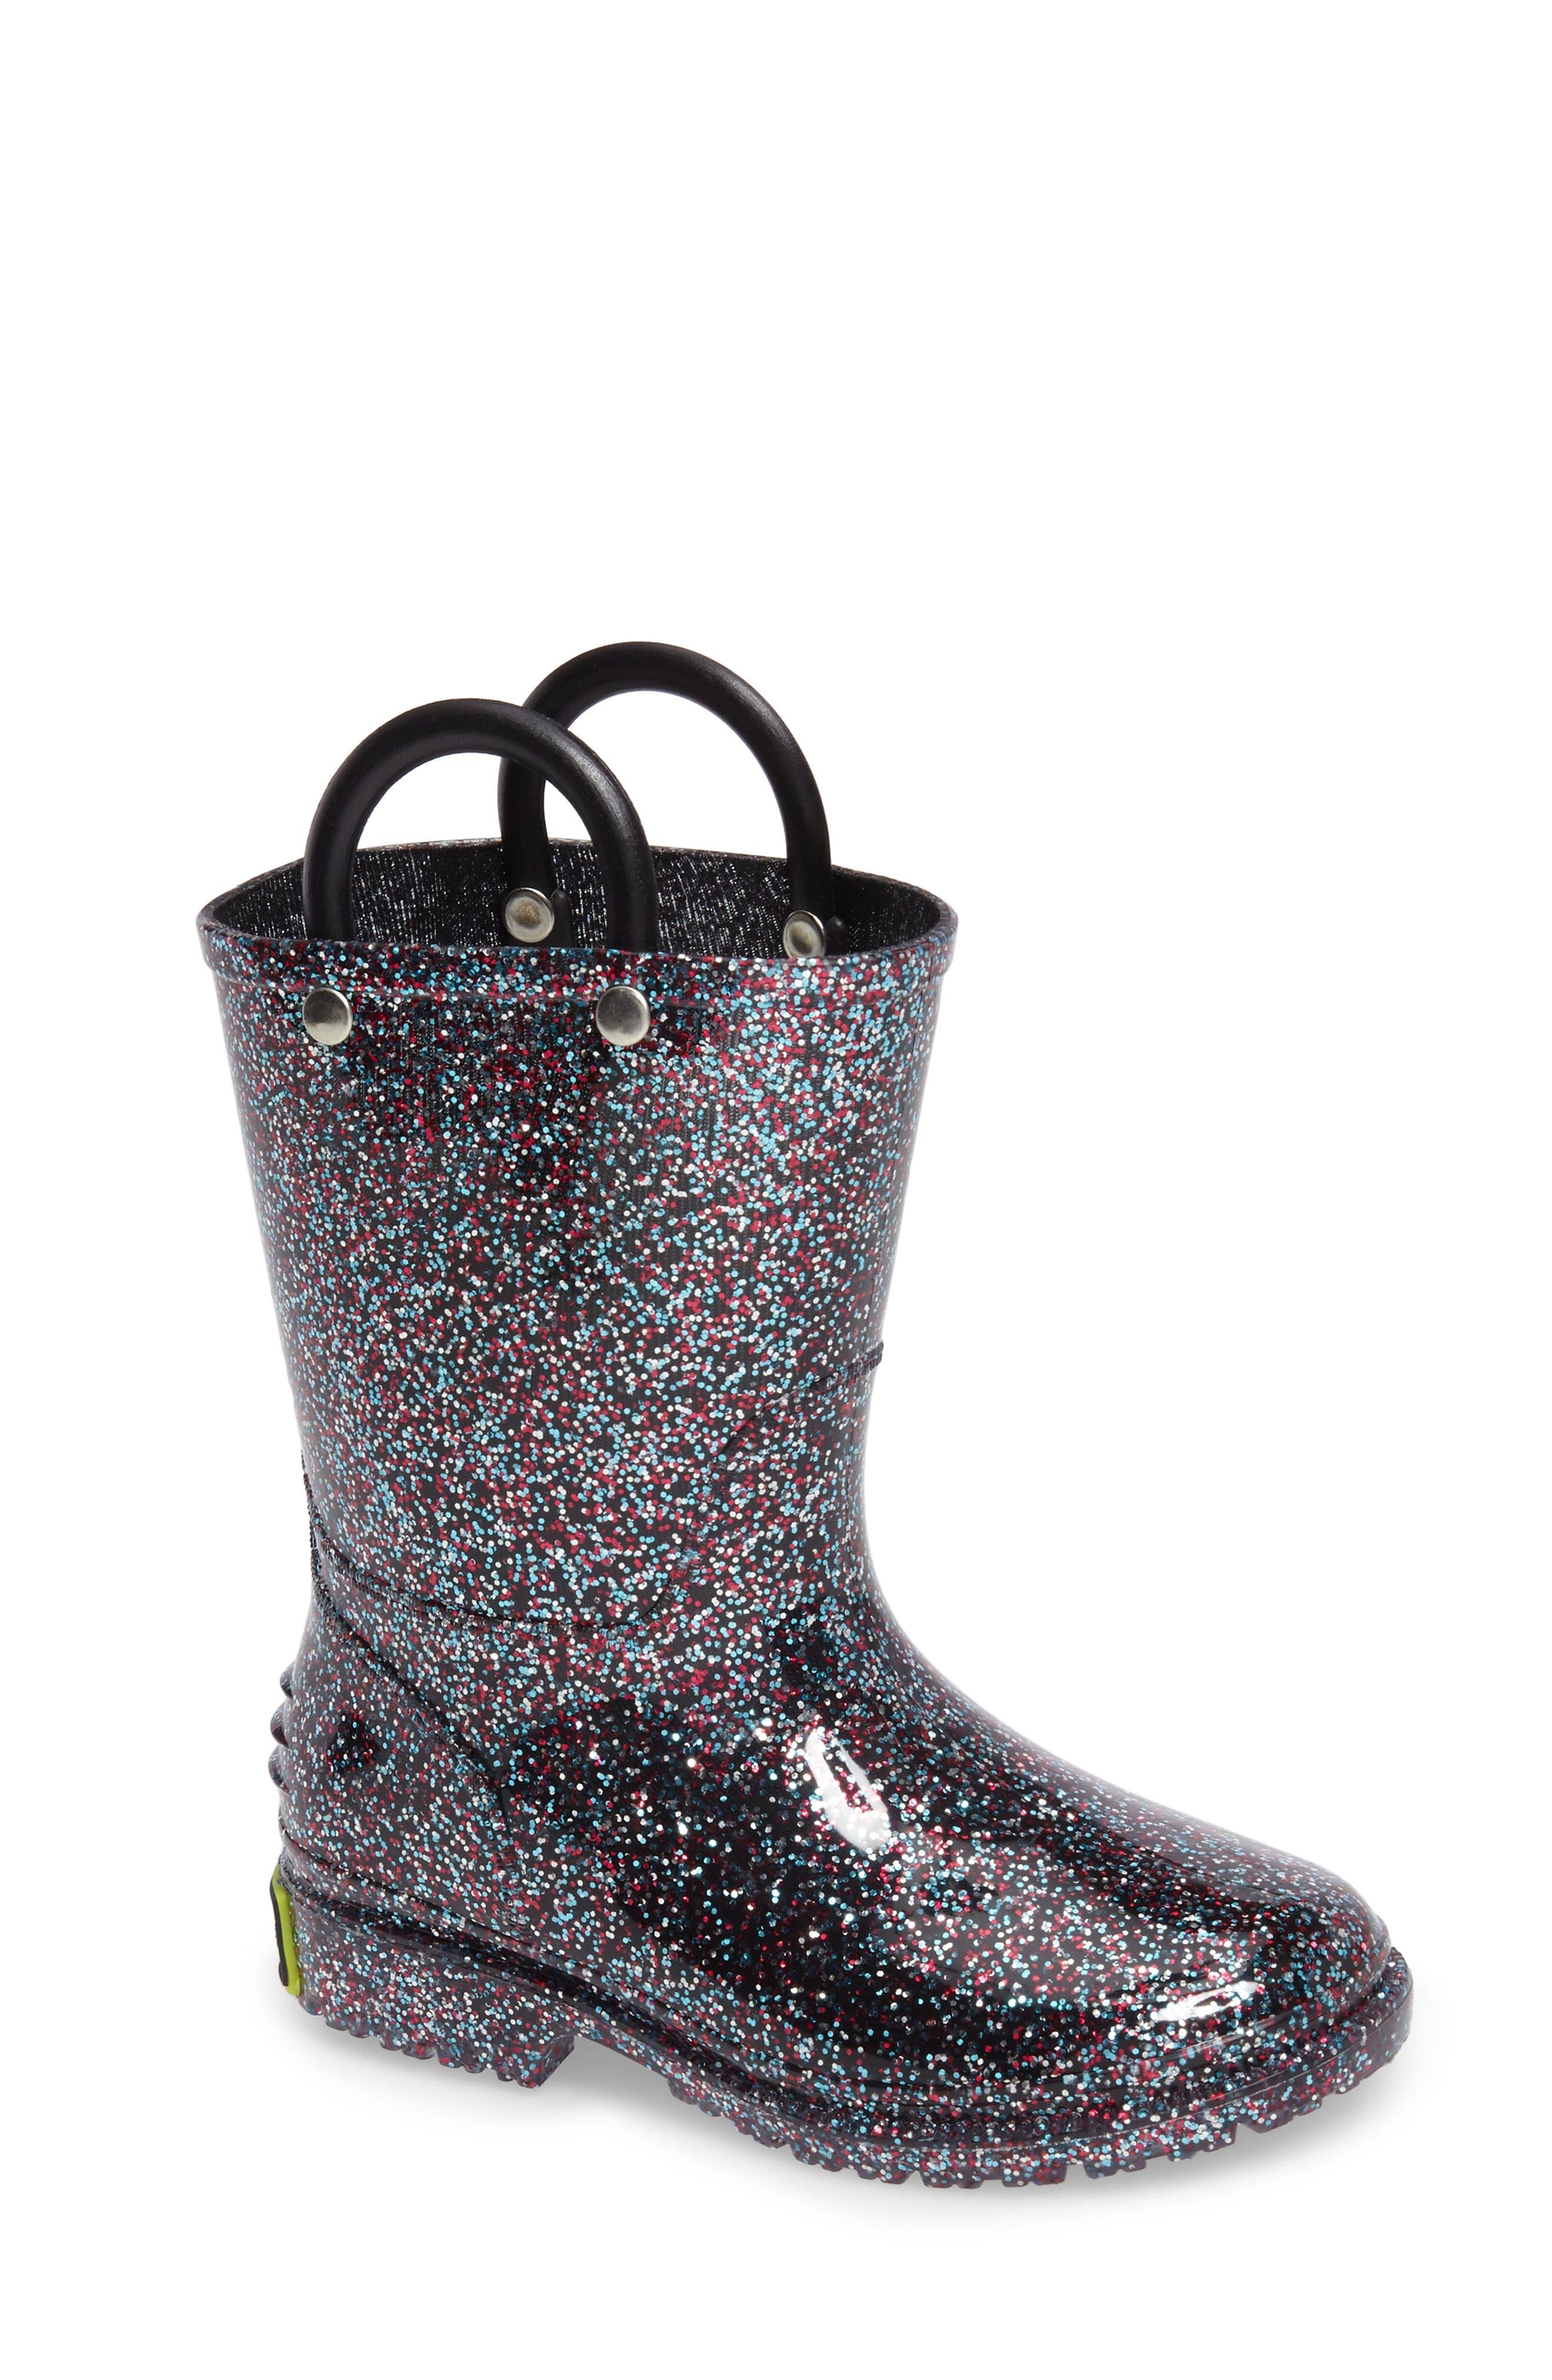 Alternate Image 1 Selected - Western Chief Glitter Rain Boot (Toddler & Little Kid)